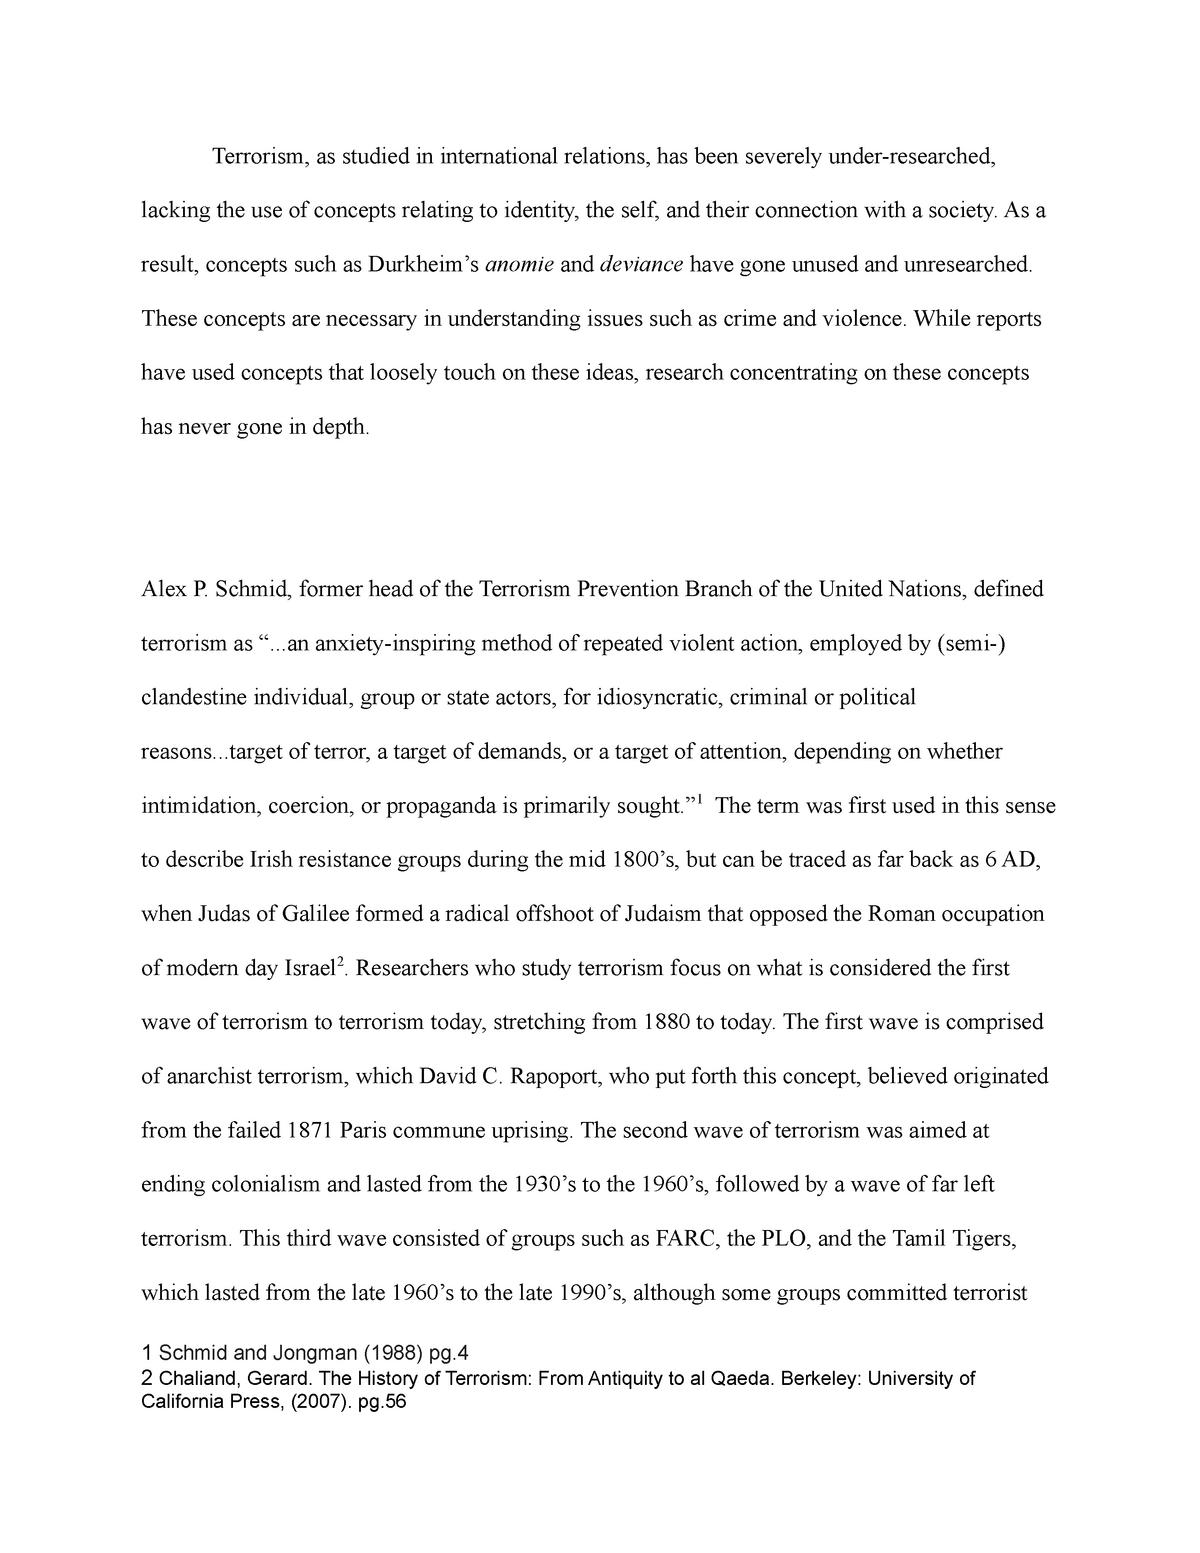 Write my custom expository essay on trump